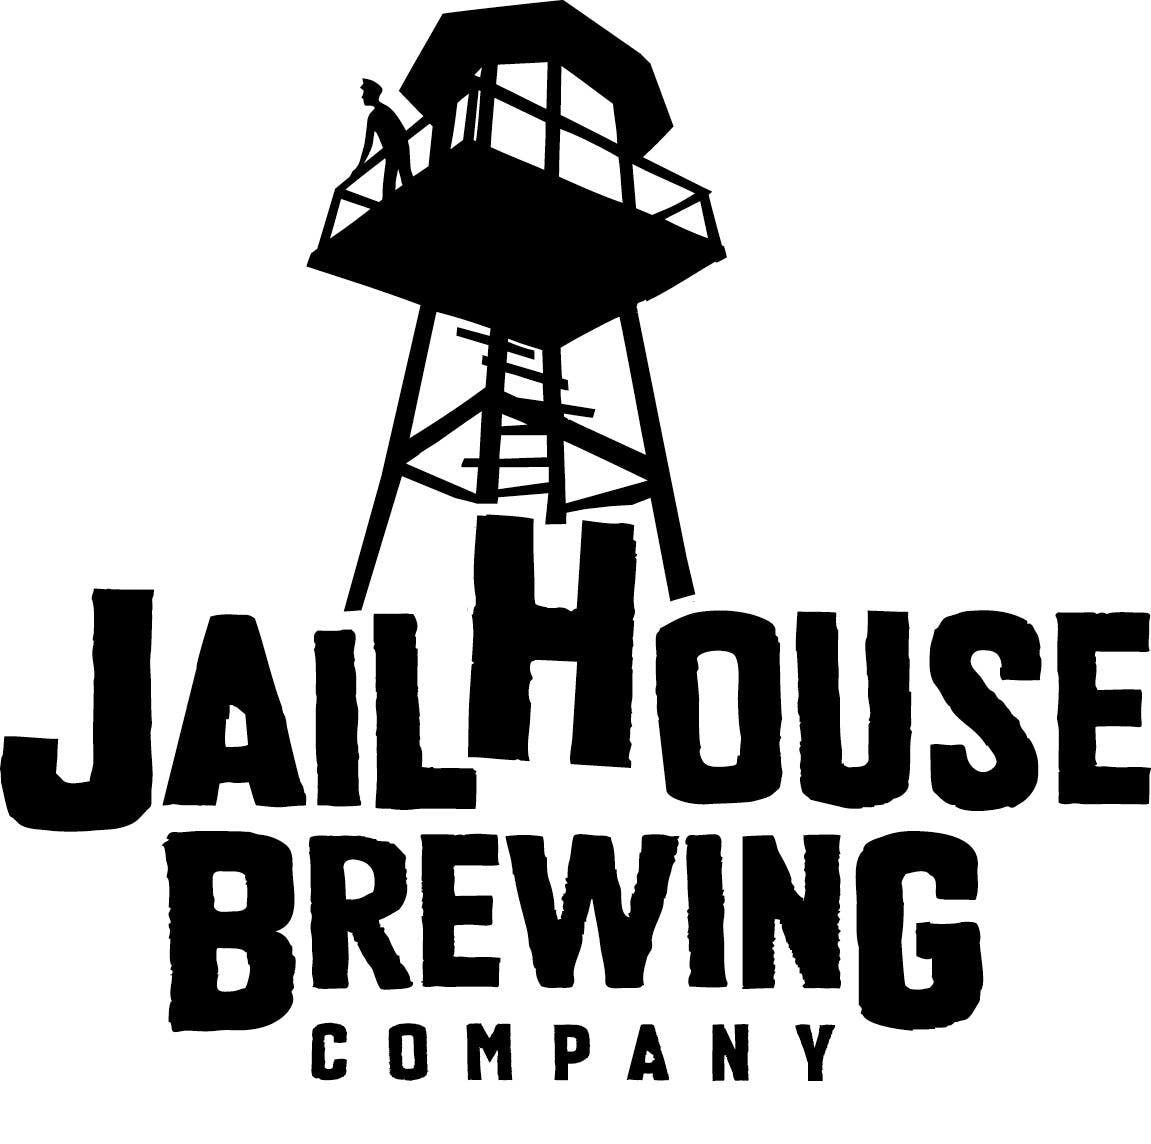 Jailhouse Brewing